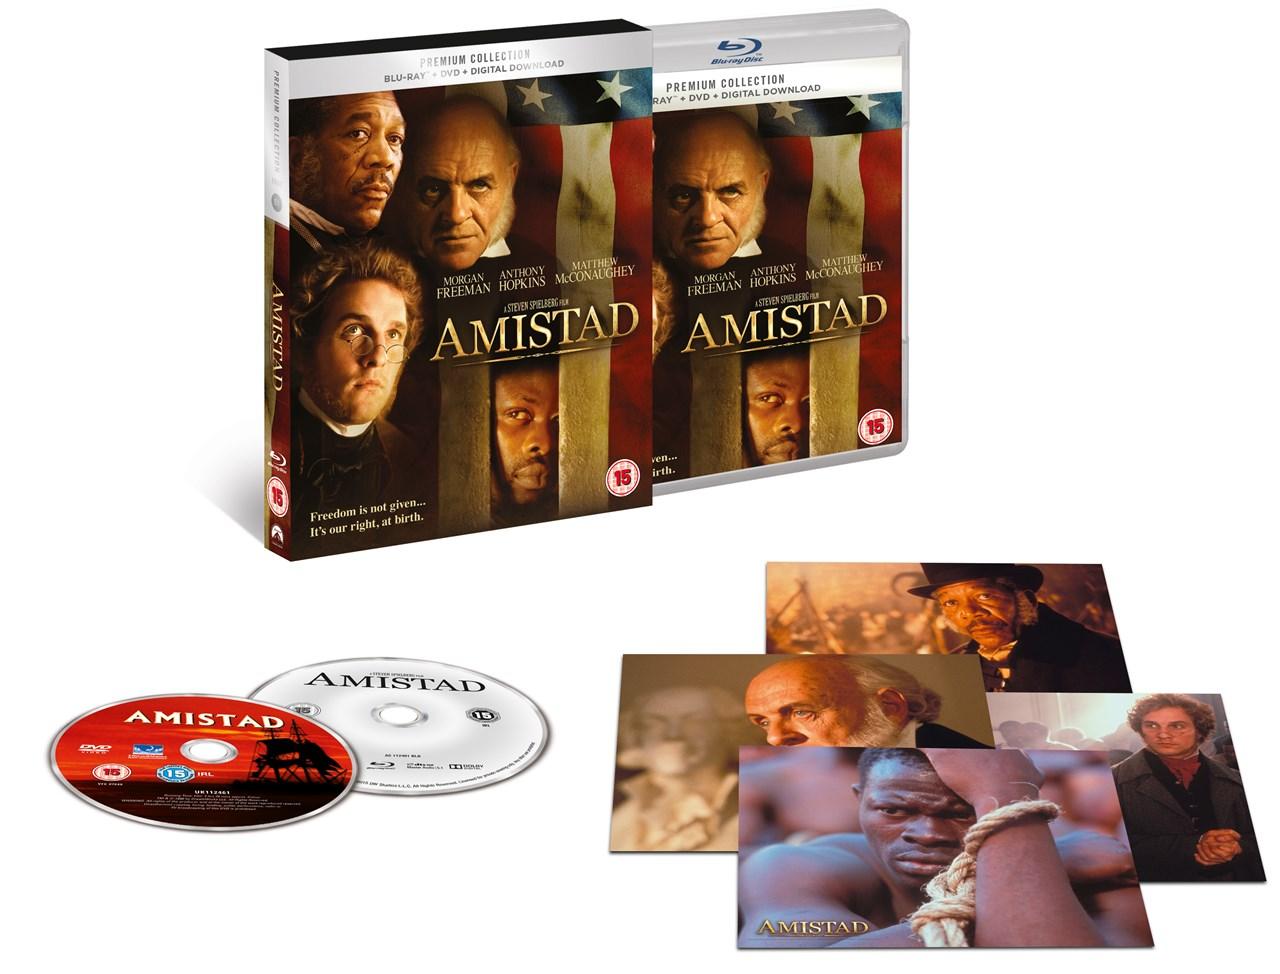 Amistad (hmv Exclusive) - The Premium Collection - 3